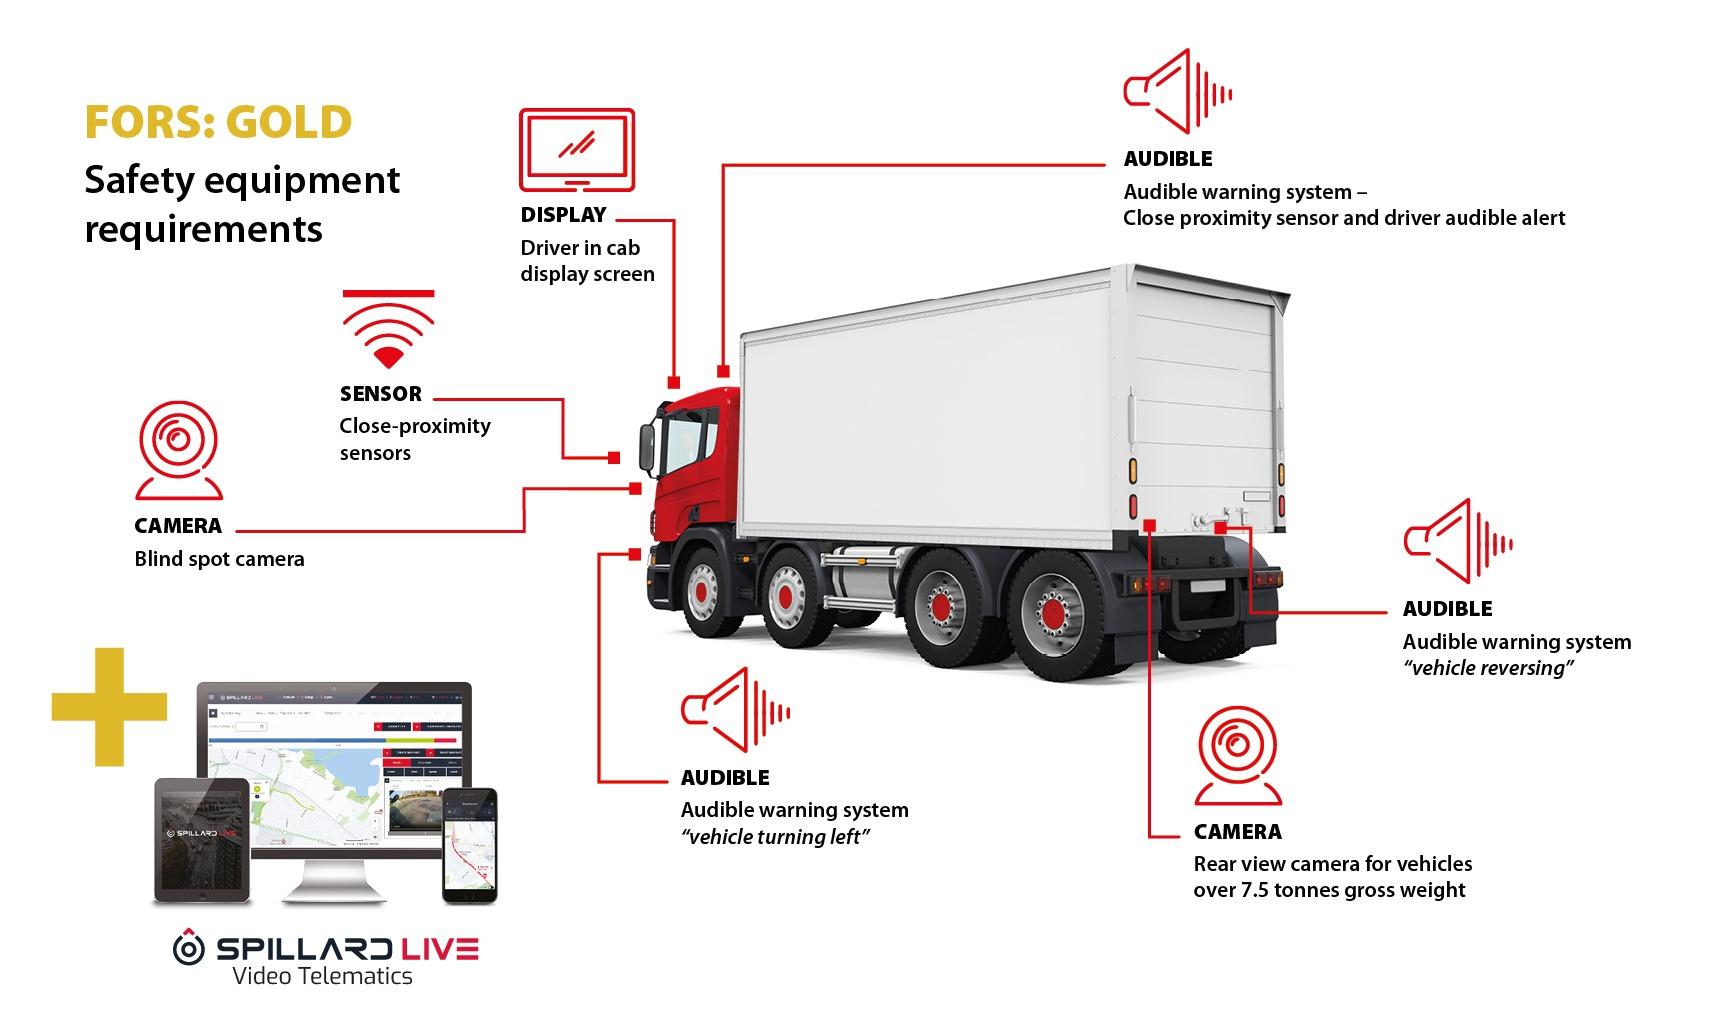 FORS/CLOCS Compliant Safe Vehicle - FORS Clocs Diagram GOLD WEB